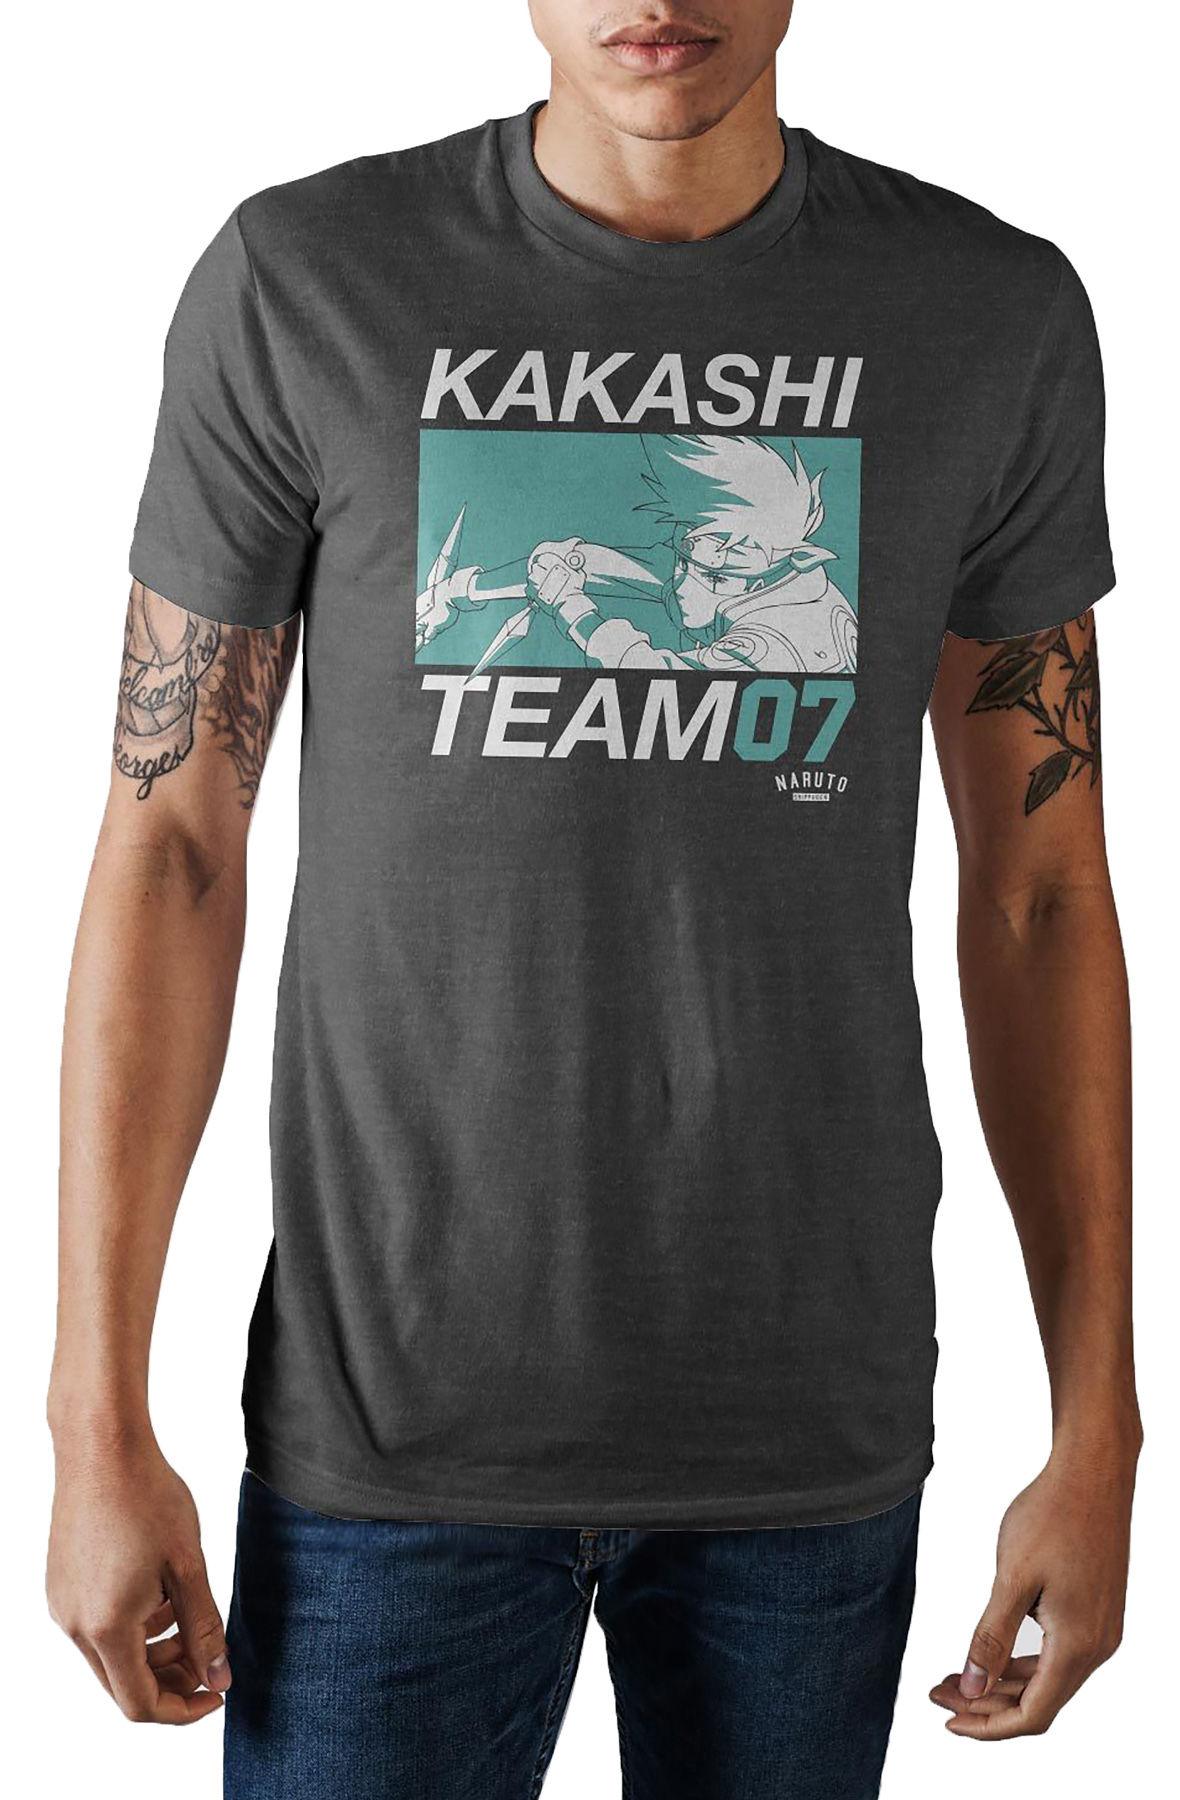 Image of The Kakashi Hatake Mens Short Sleeve Tee in Black